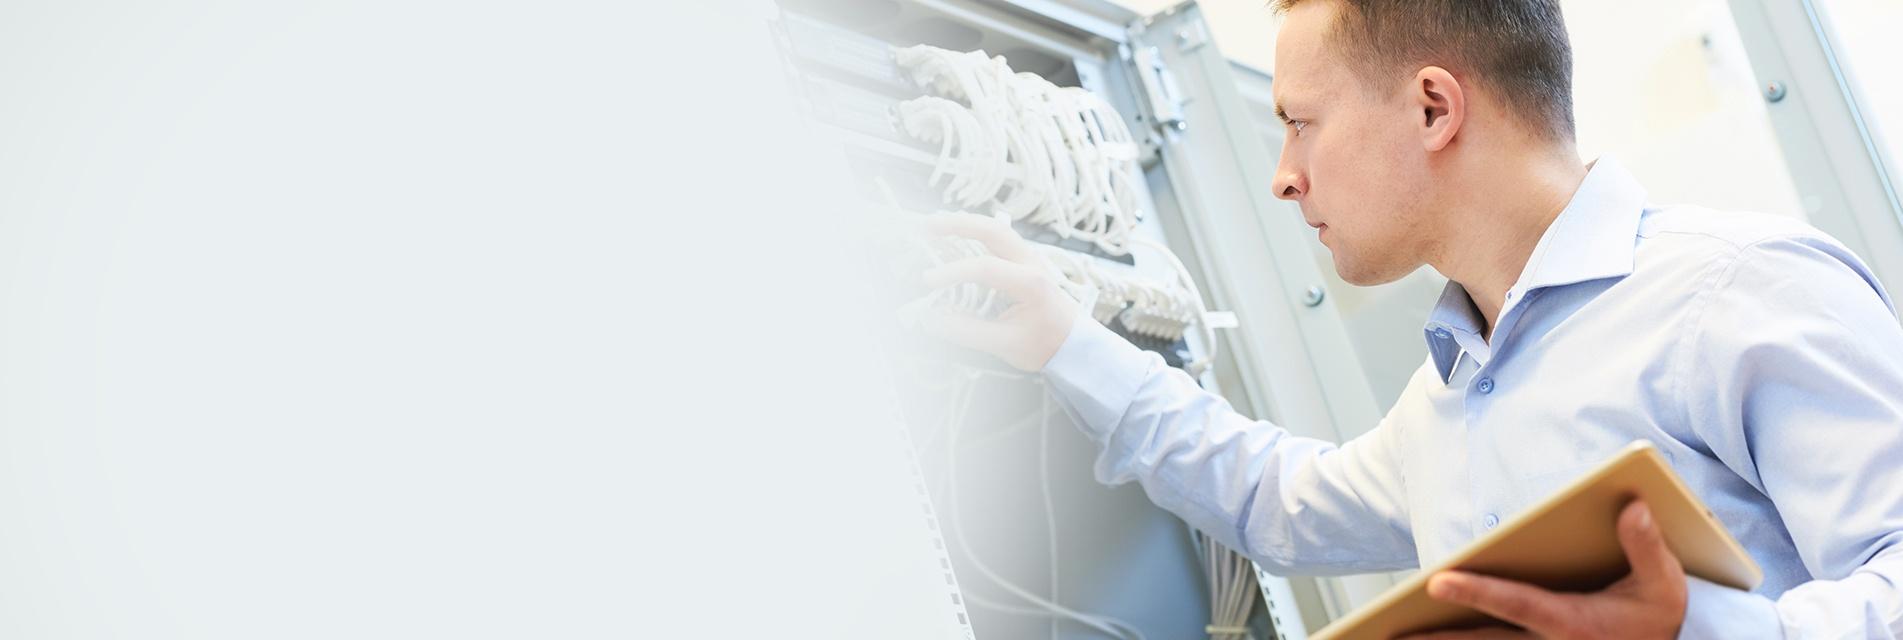 proper server maintenance is intergral to business success